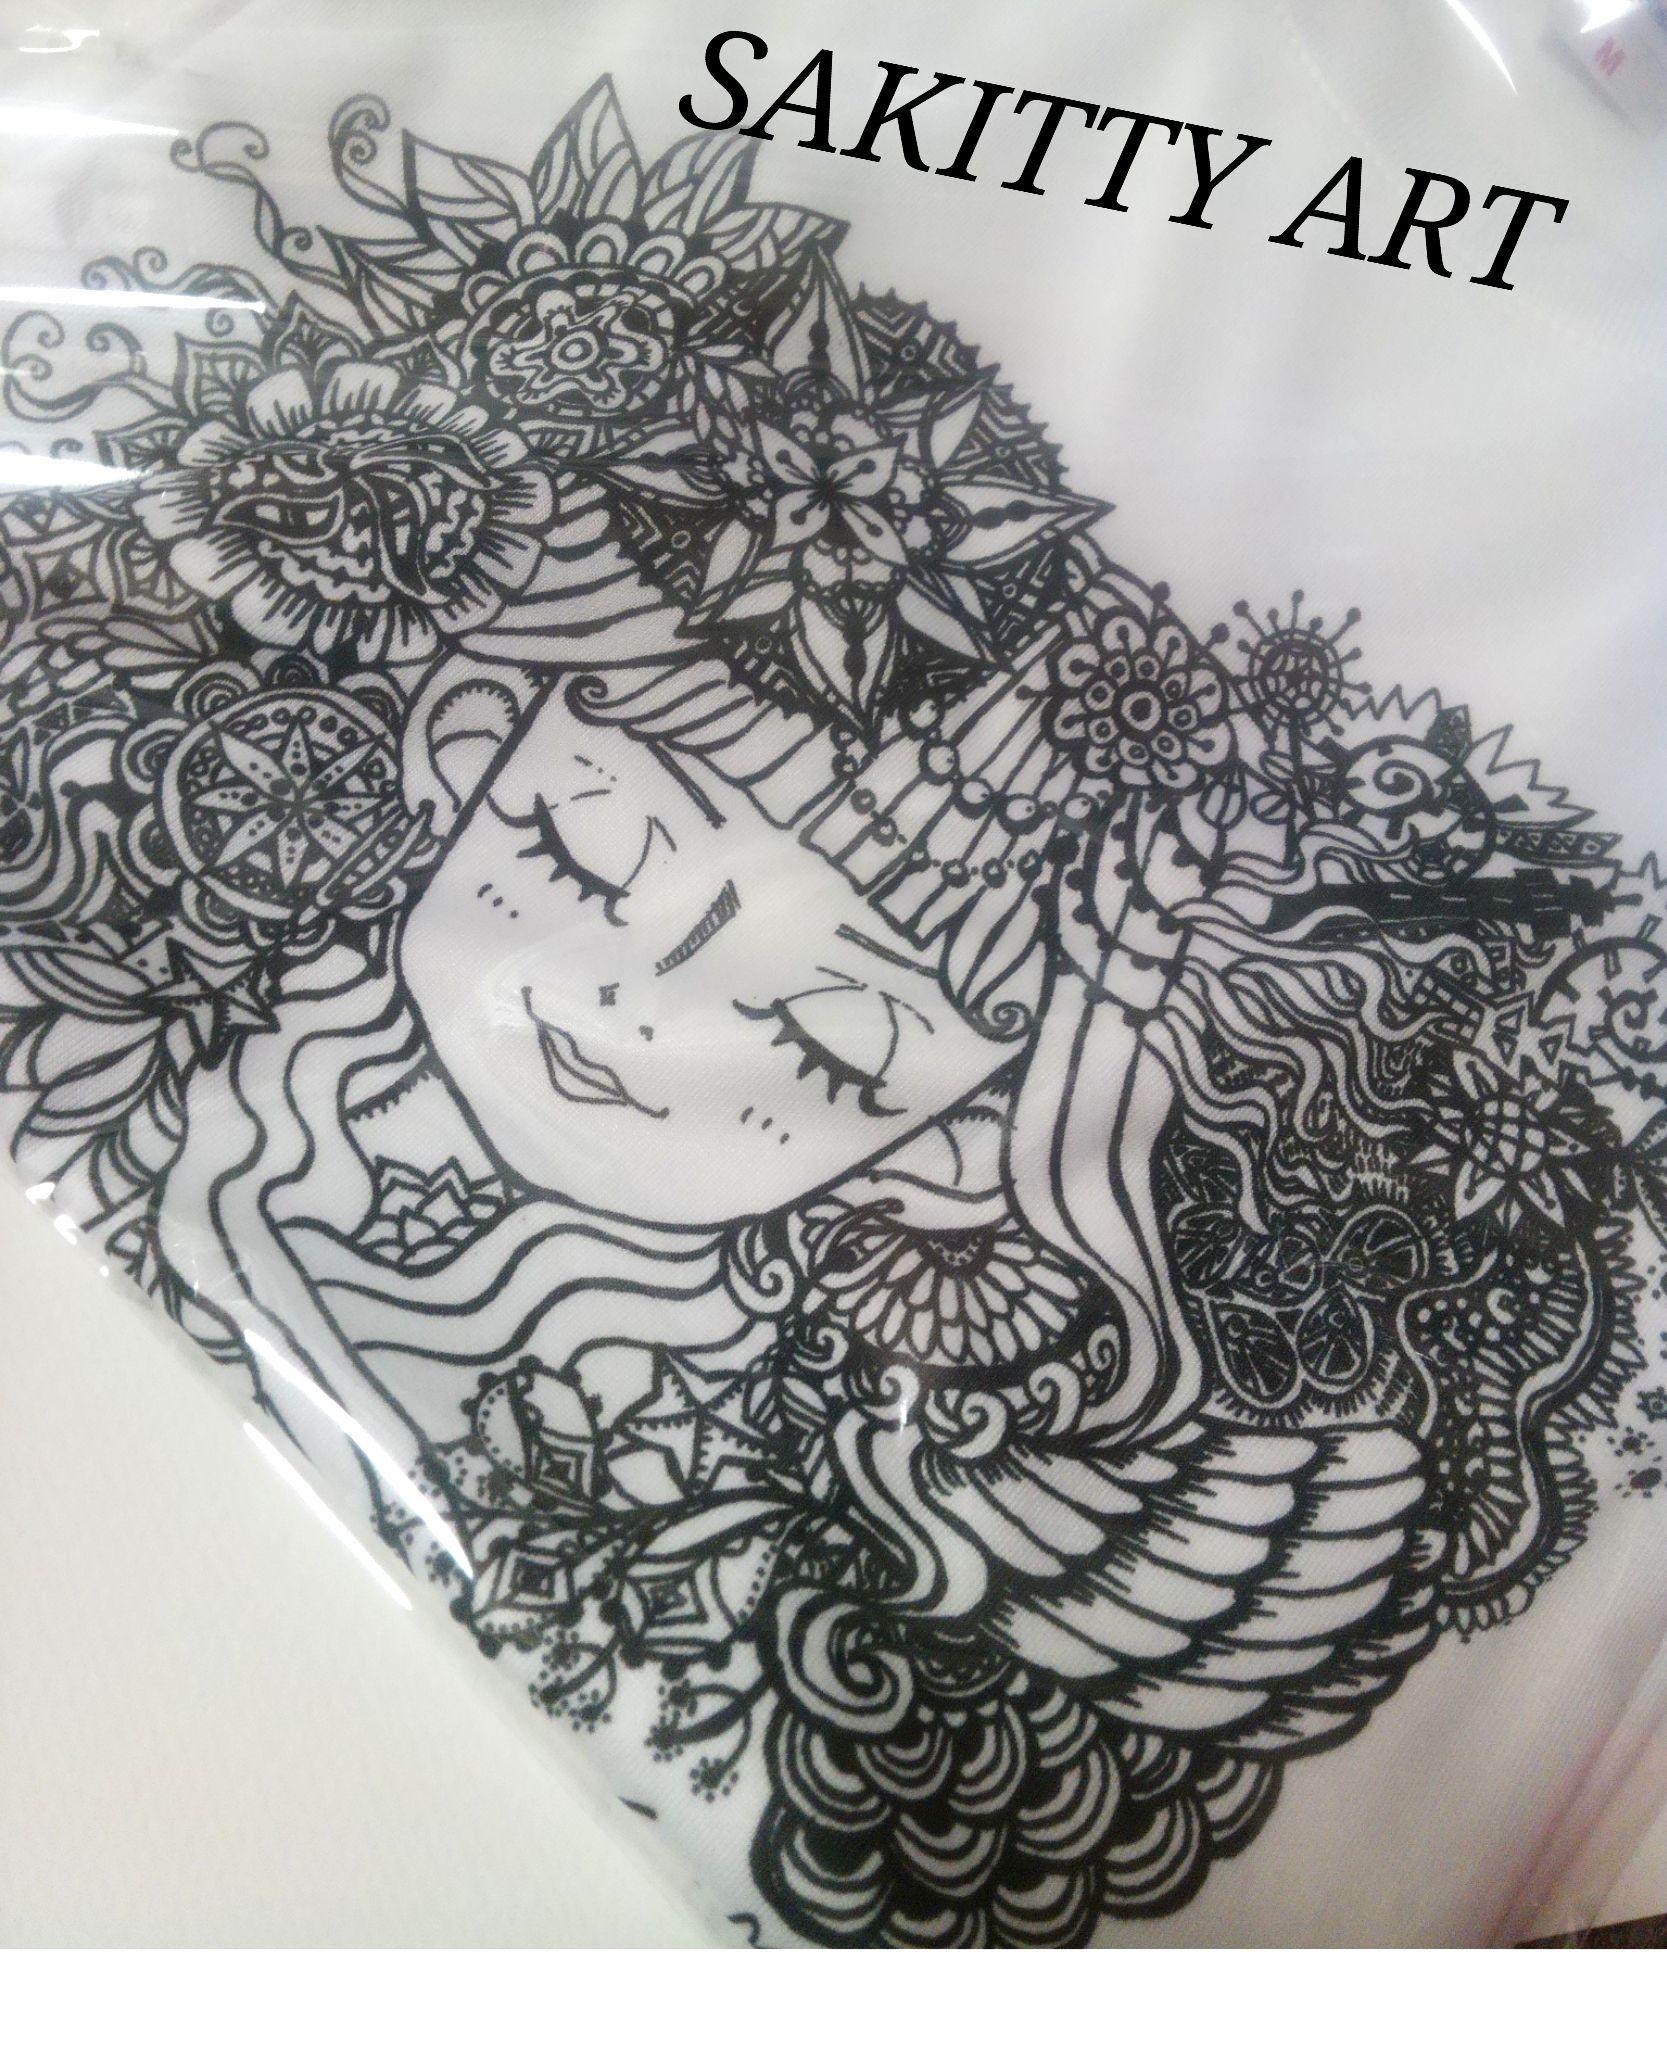 SAKITTY ART?レディースセット¥6200→値下げ